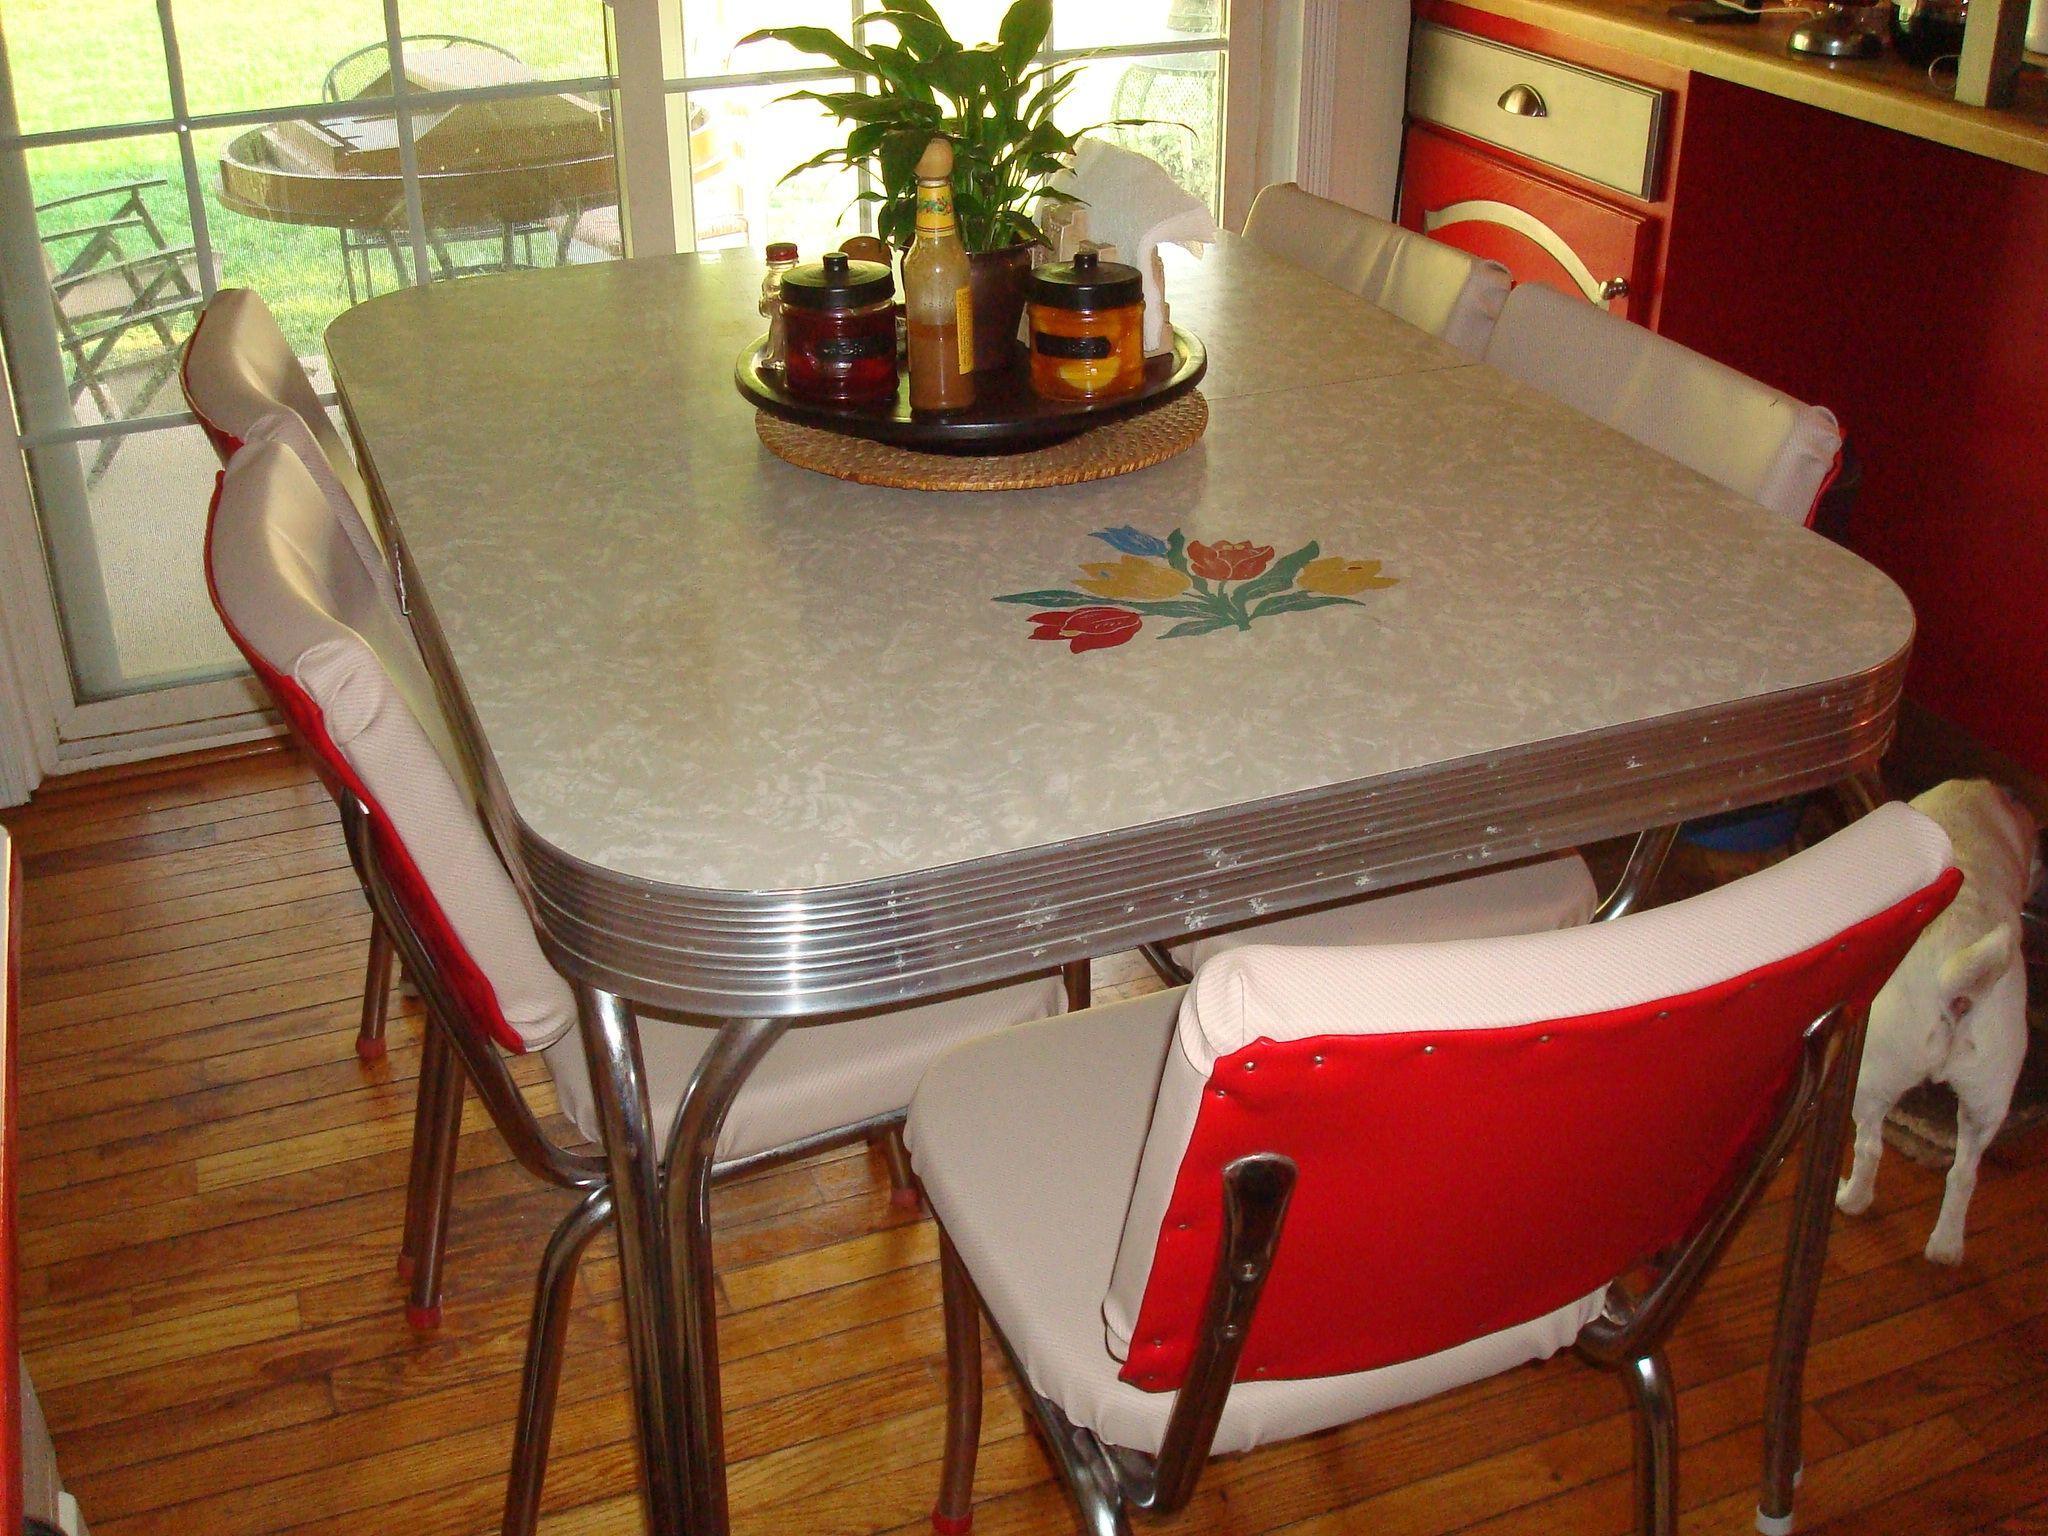 60 style kitchen table